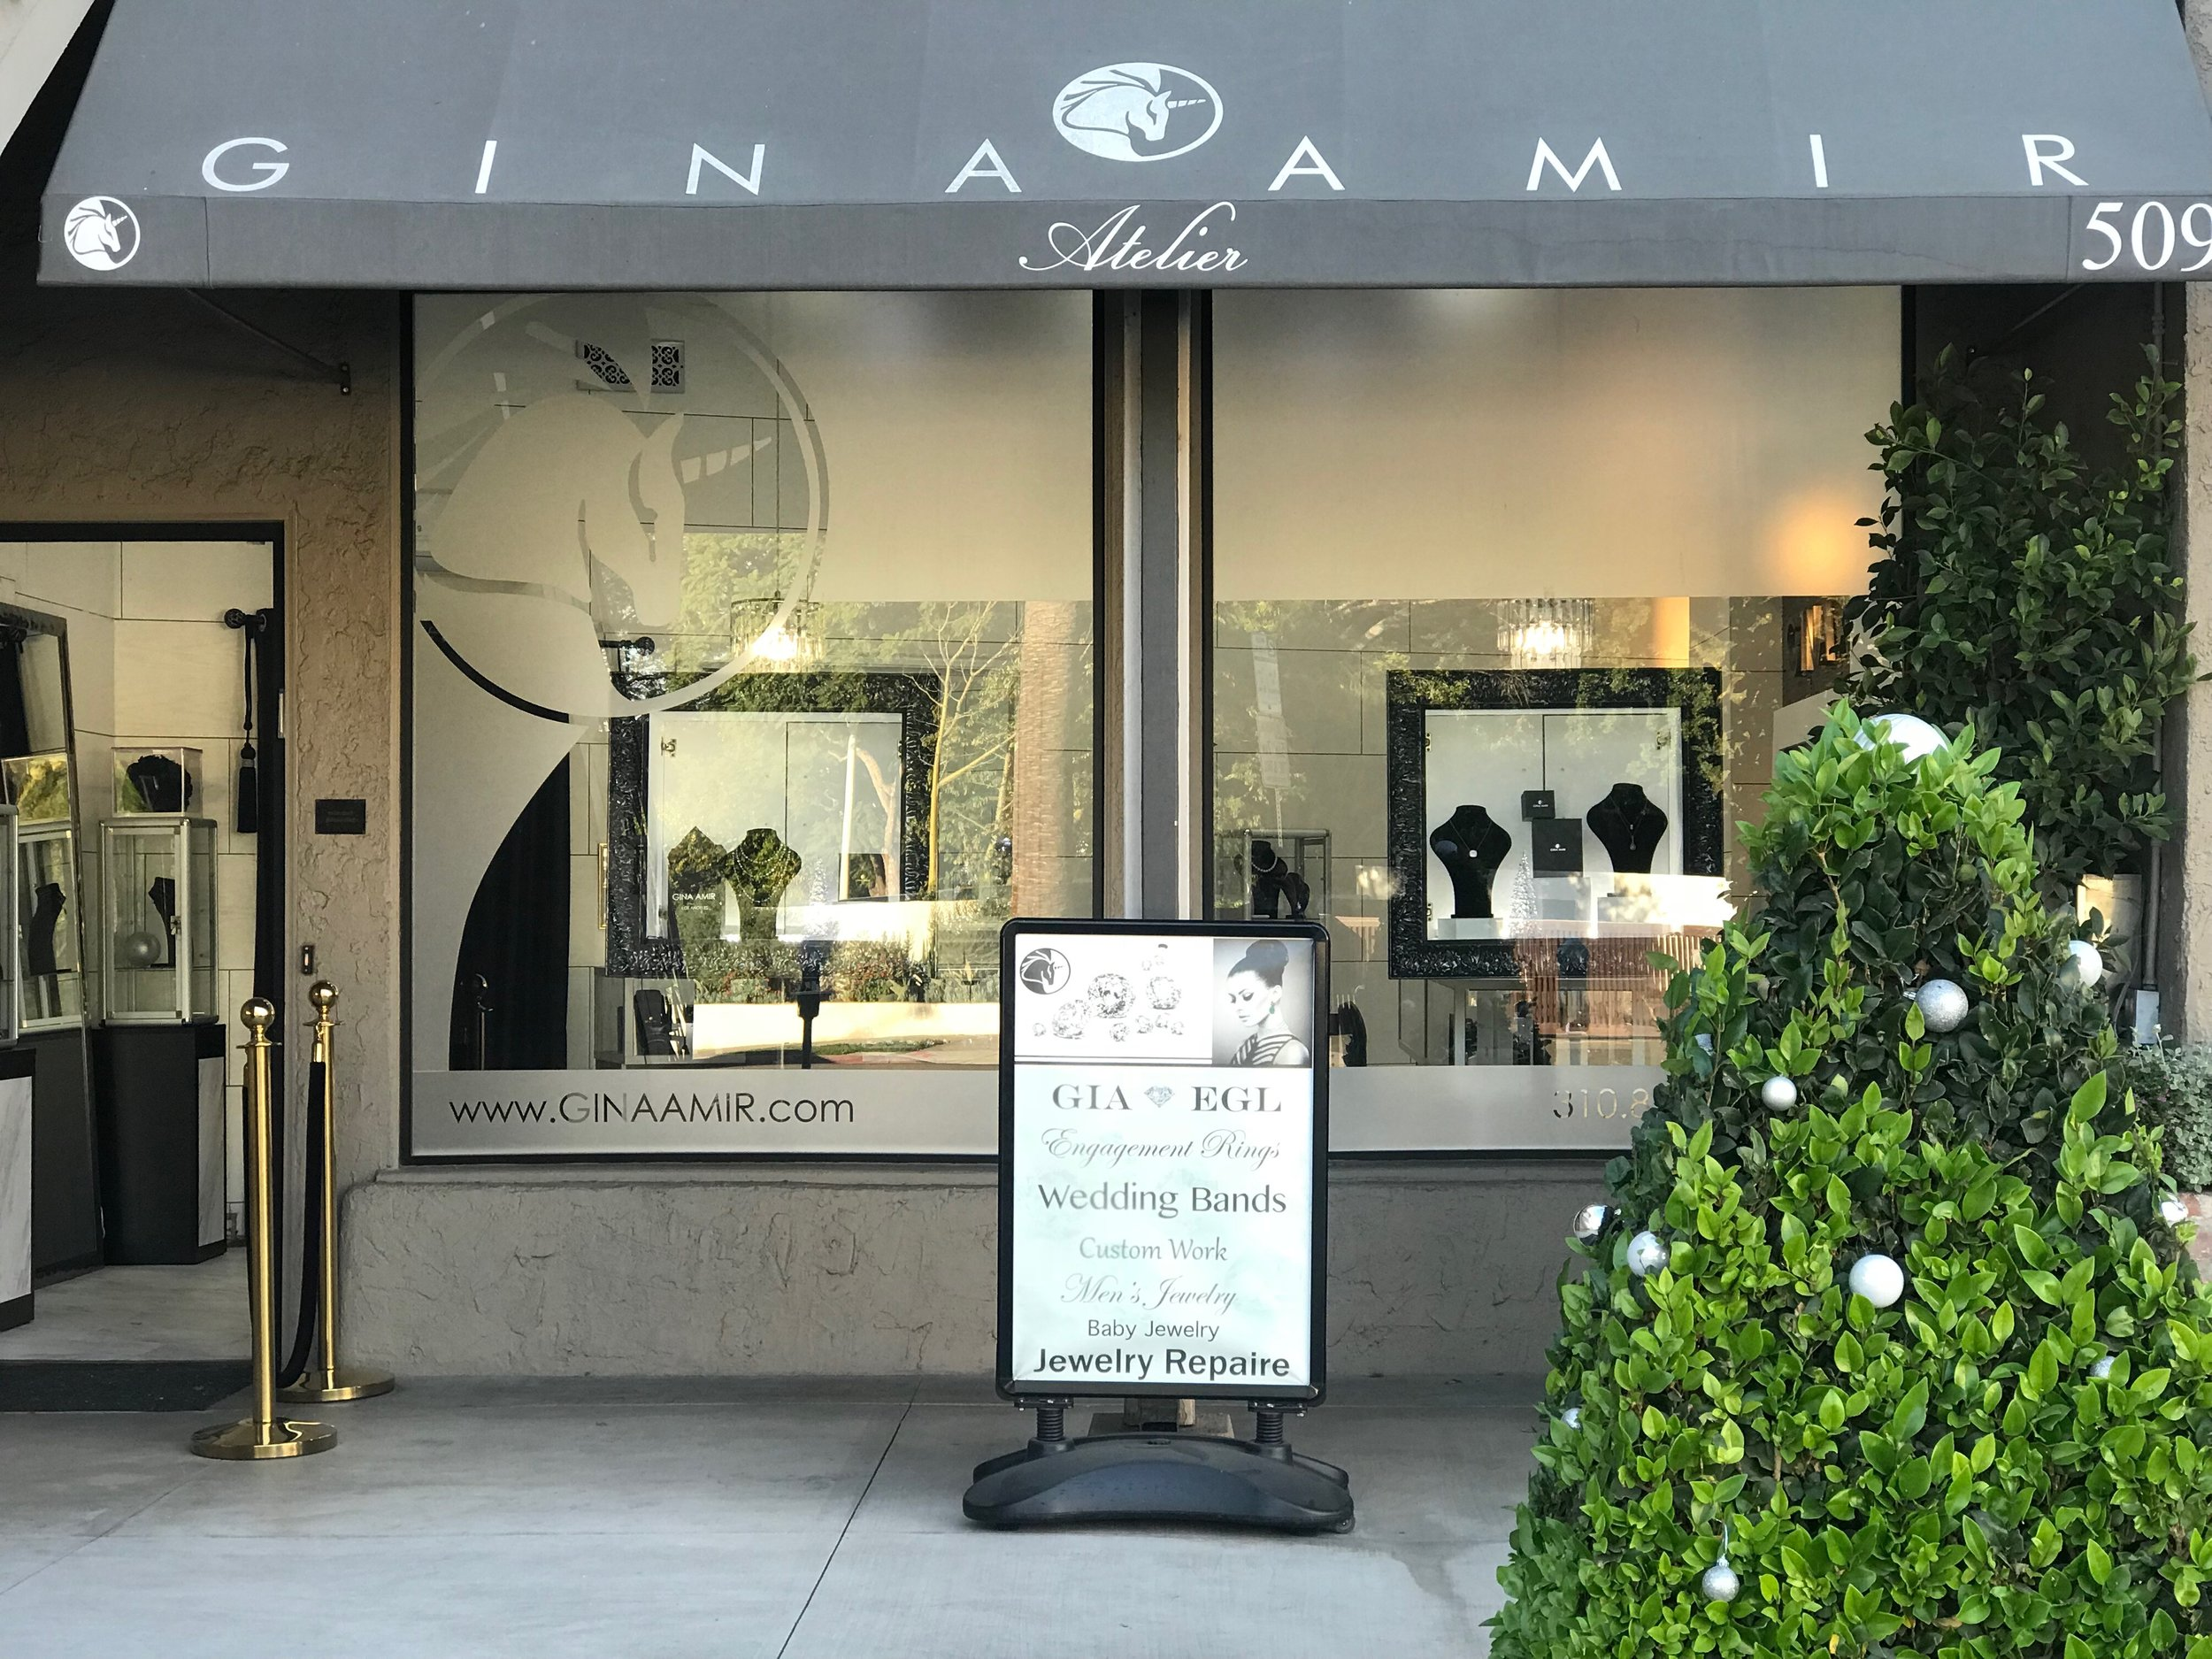 Gina Amir Store Front 1.JPG